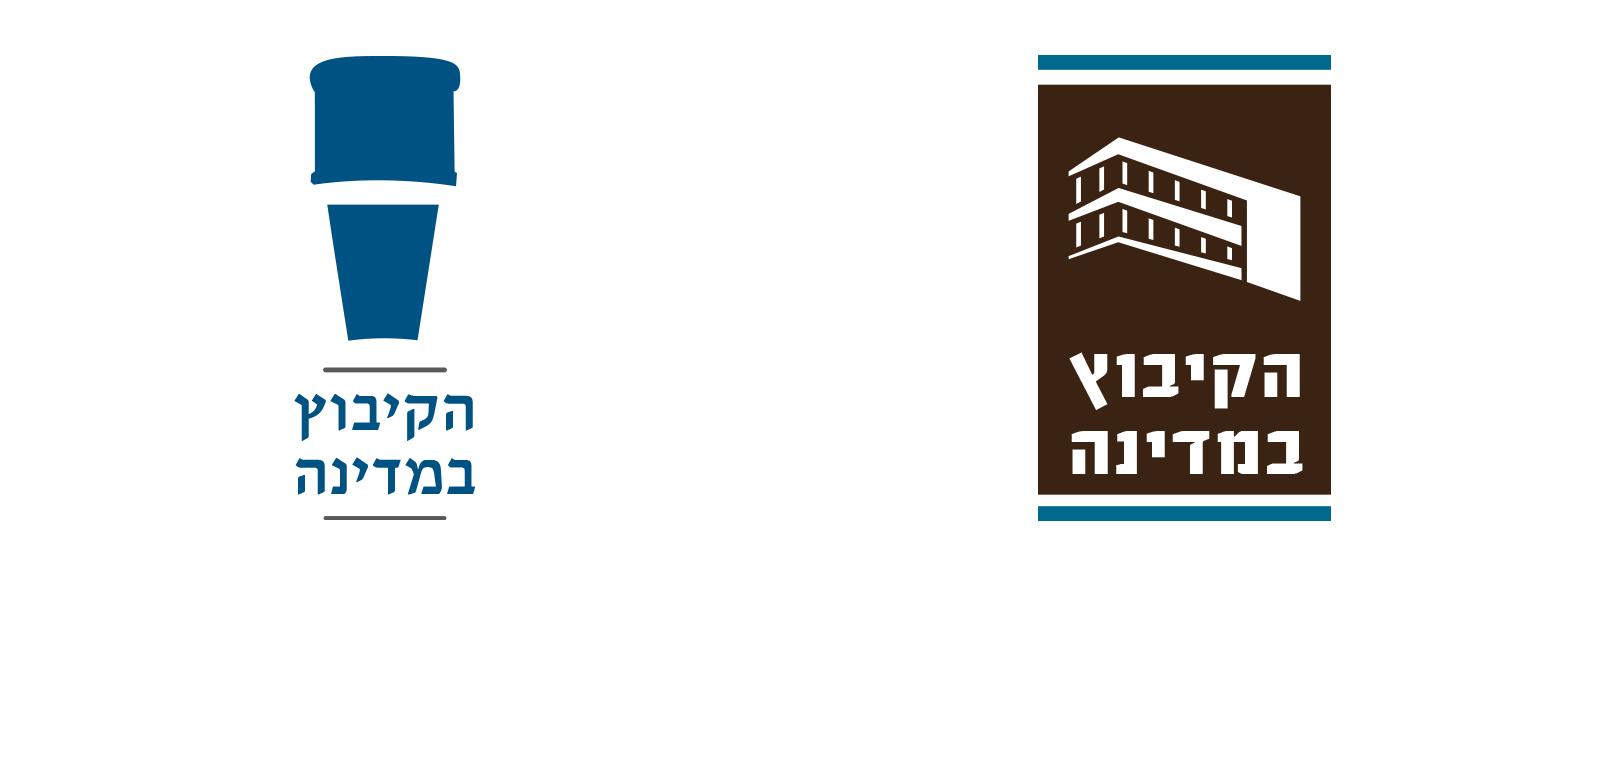 https://bigeyes.co.il/wp-content/uploads/2019/06/KibbutzBooks-logo-1.png